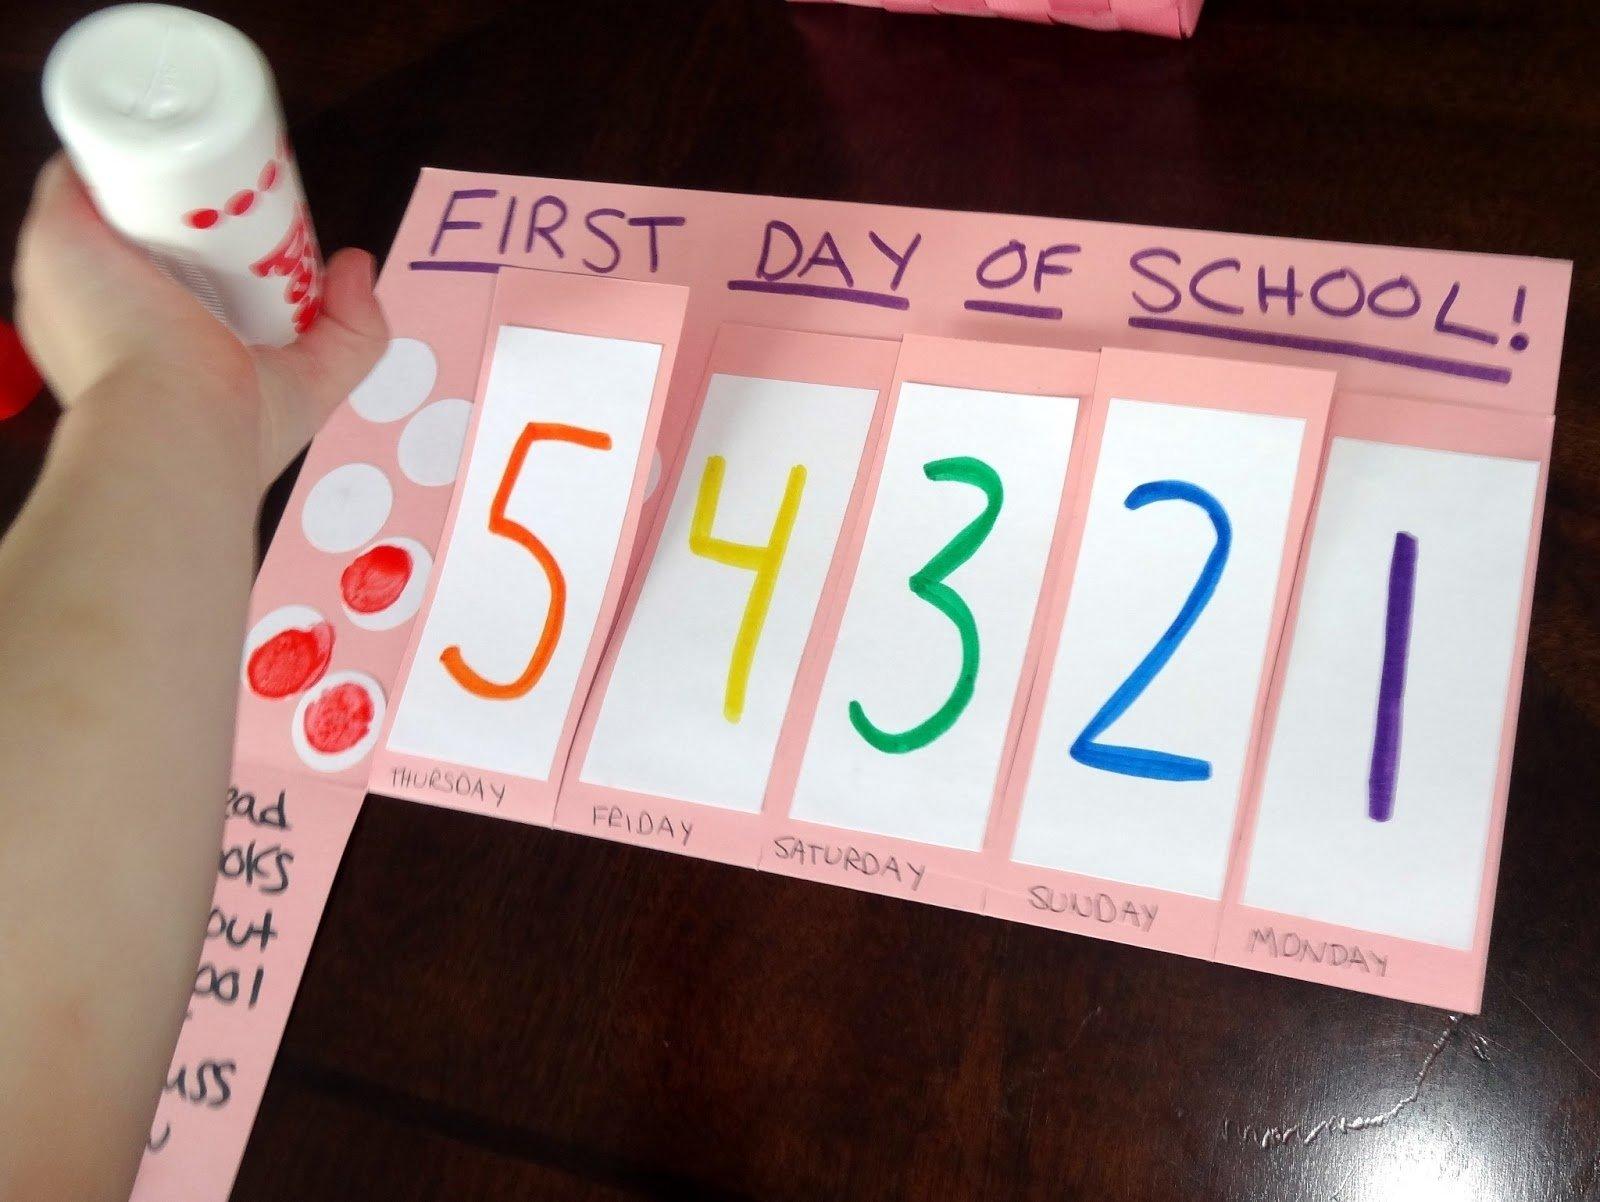 10 Fabulous First Day Of Preschool Ideas first day of school first day of school activities for kindergarten